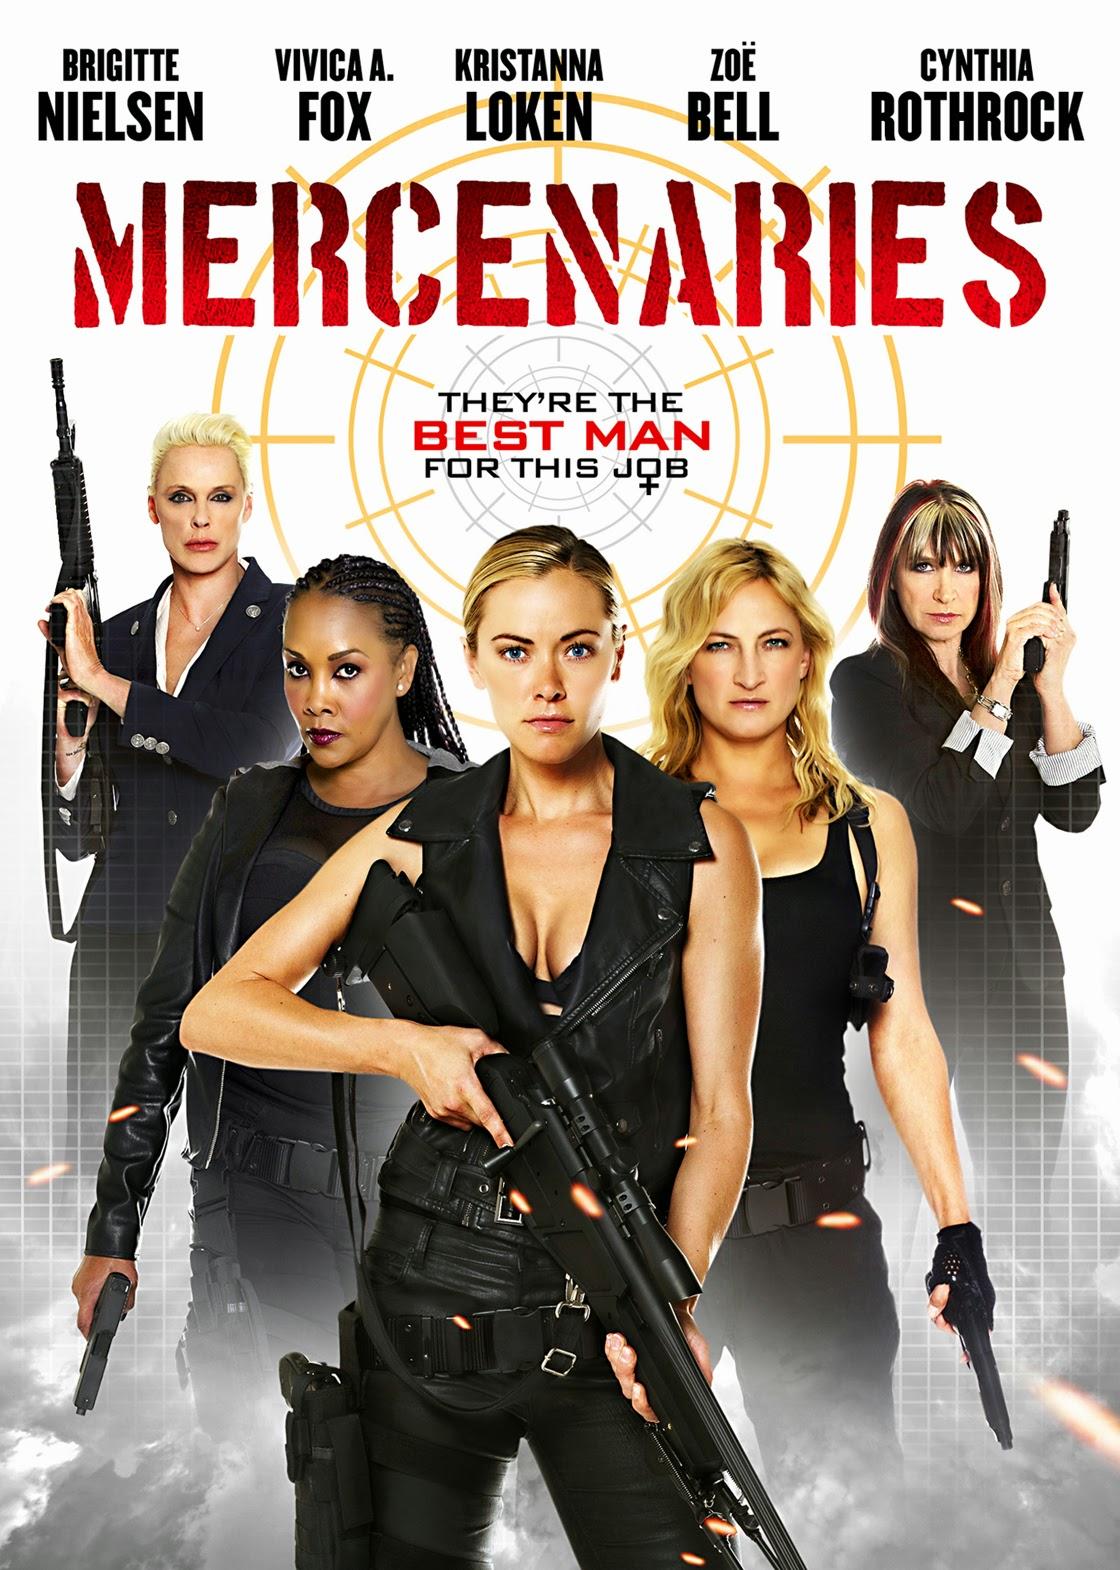 Mercenaries โคตรพยัคฆ์สาว ทีมมหากาฬ [HD]